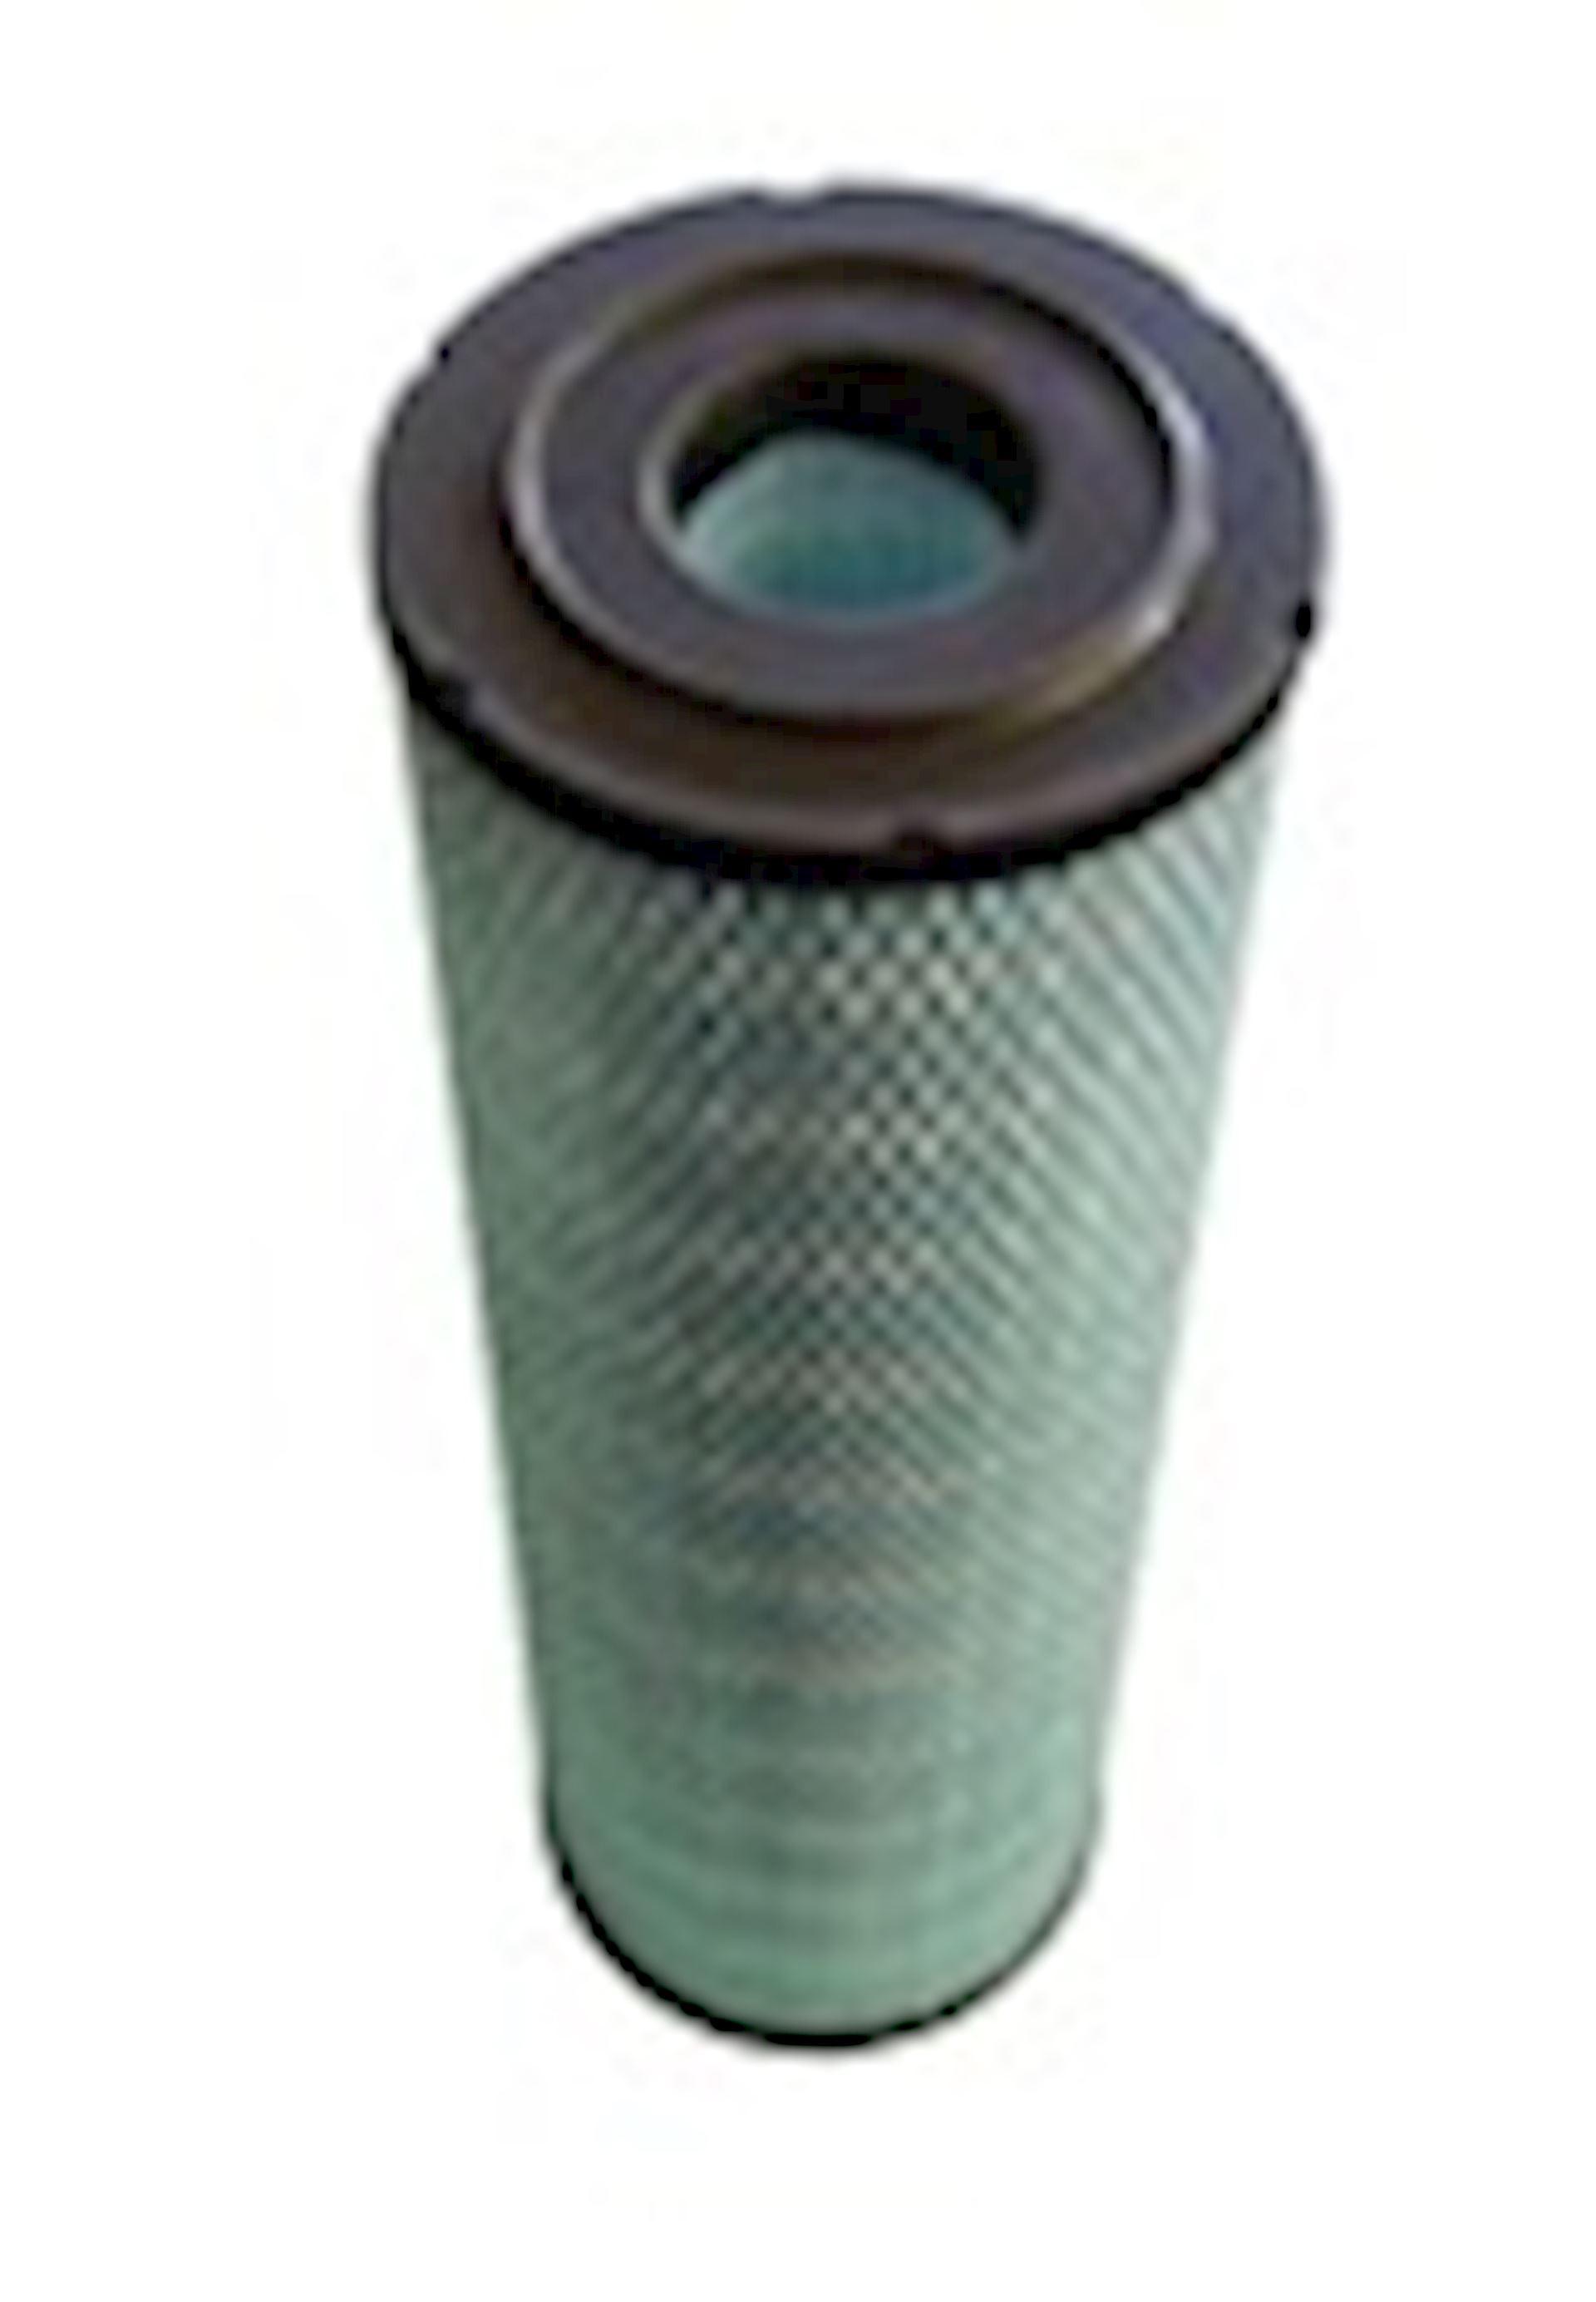 Filtr kabinowy  SKL 46300